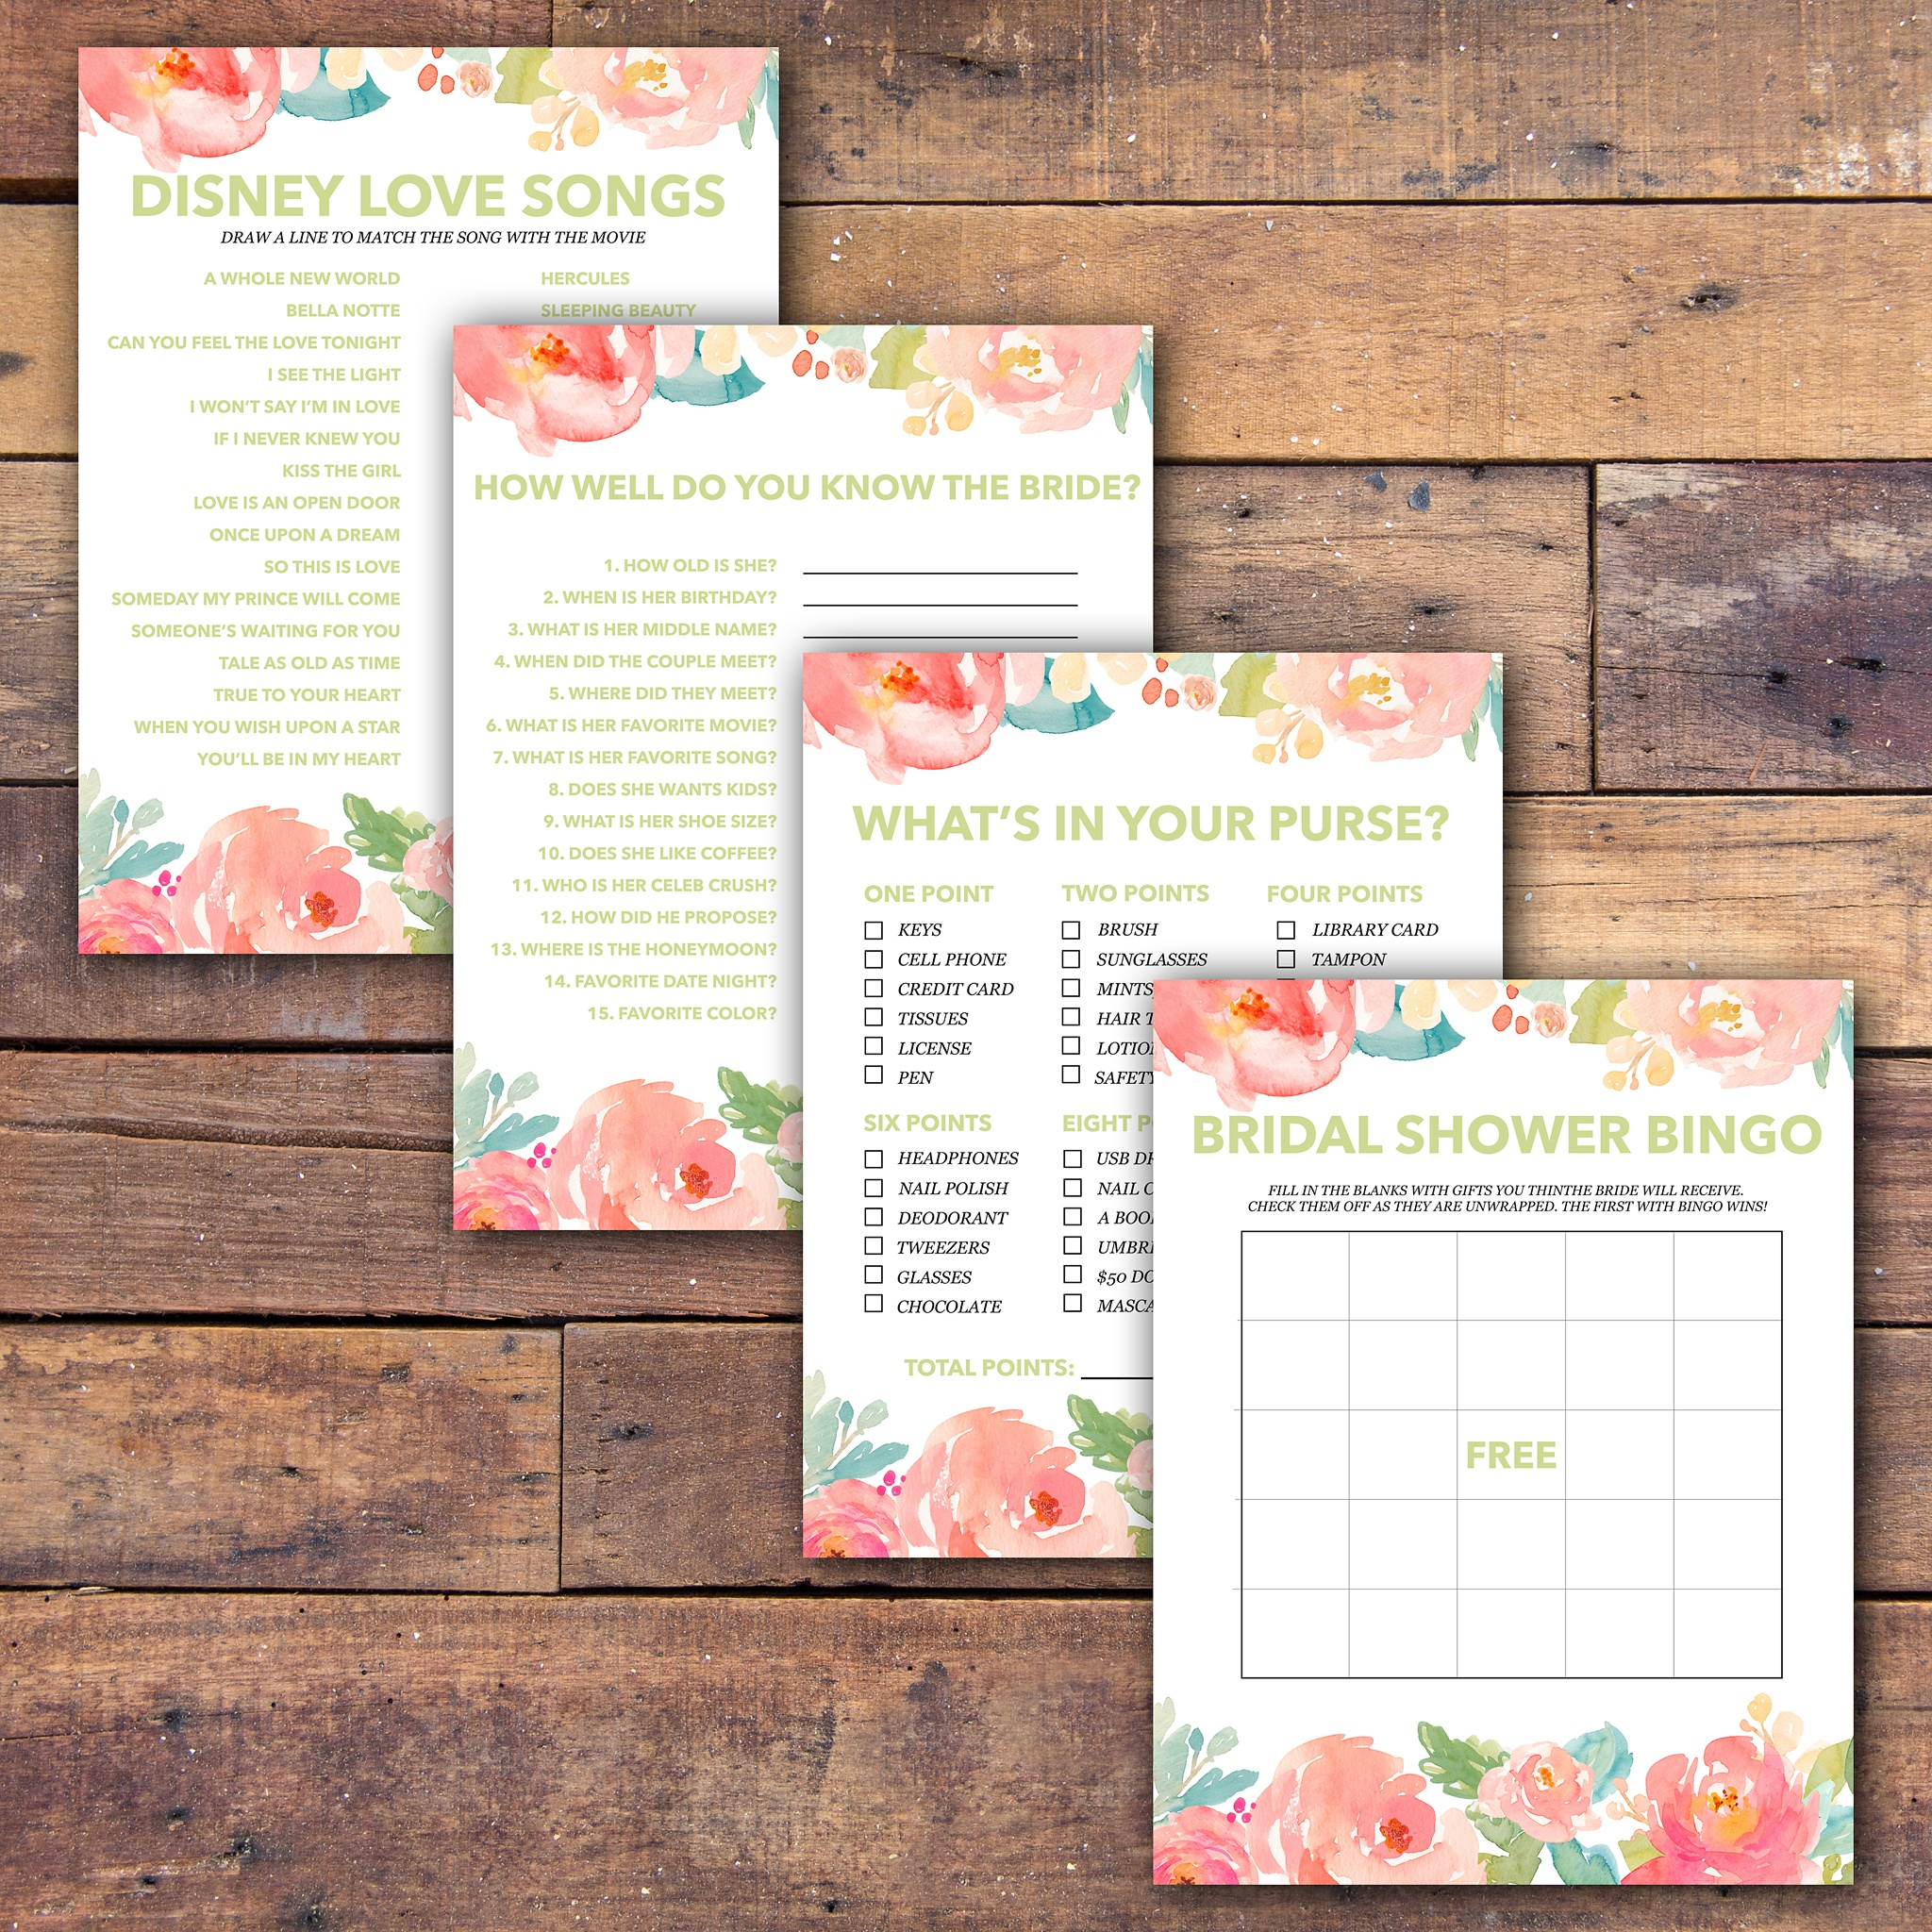 Bridal Shower Games Free Printable - - Samantha Jean Photograhy - Free Printable Household Shower Games